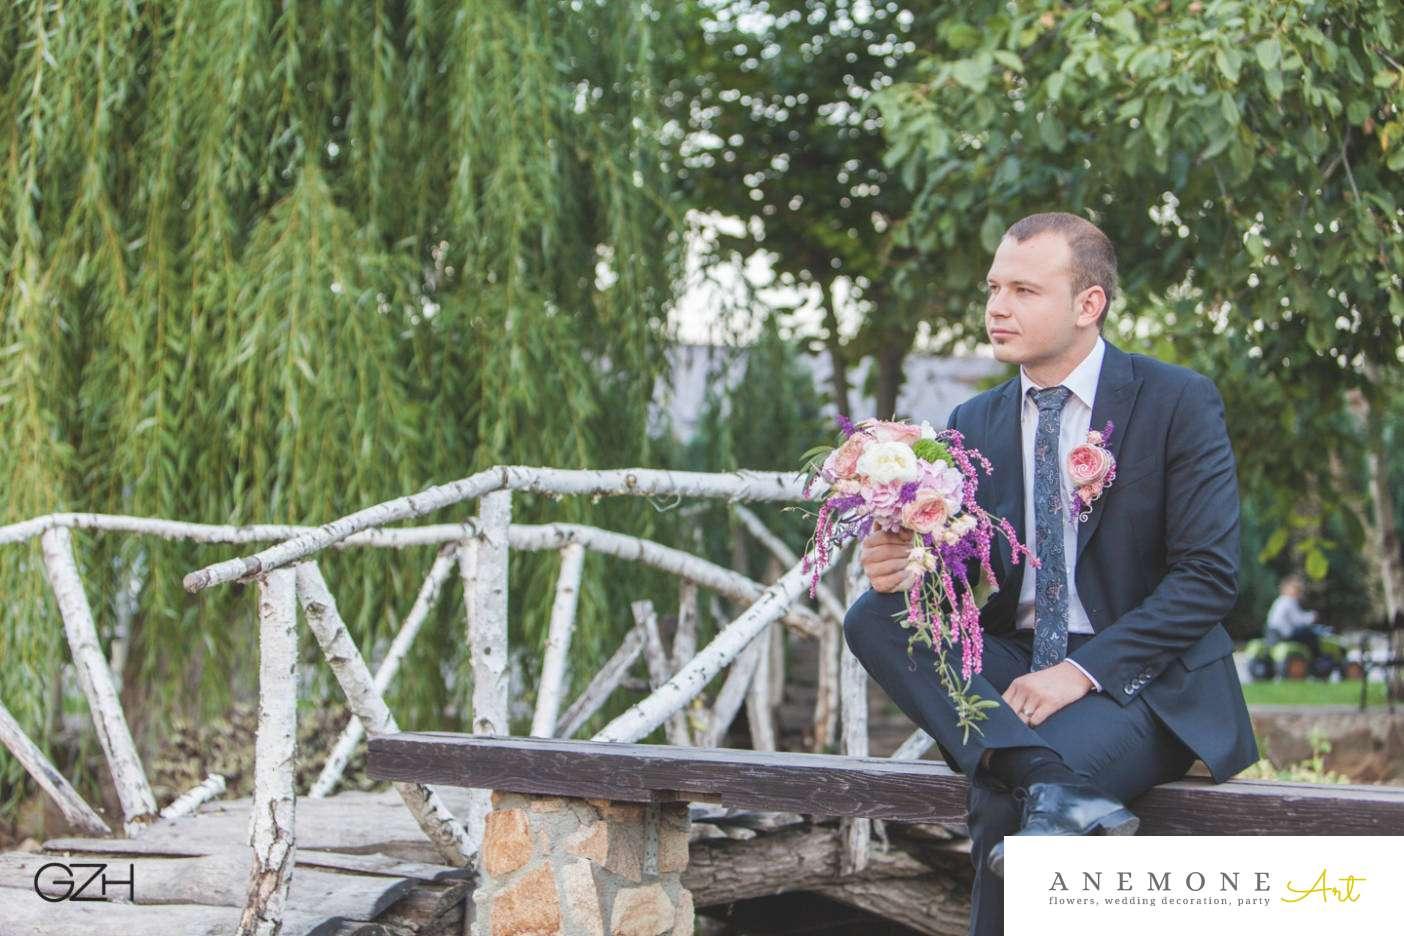 Poza, foto cu Flori de nunta buchet mireasa, bujori, cocarda, curgator, trandafiri englezesti in Arad, Timisoara, Oradea (wedding flowers, bouquets) nunta Arad, Timisoara, Oradea